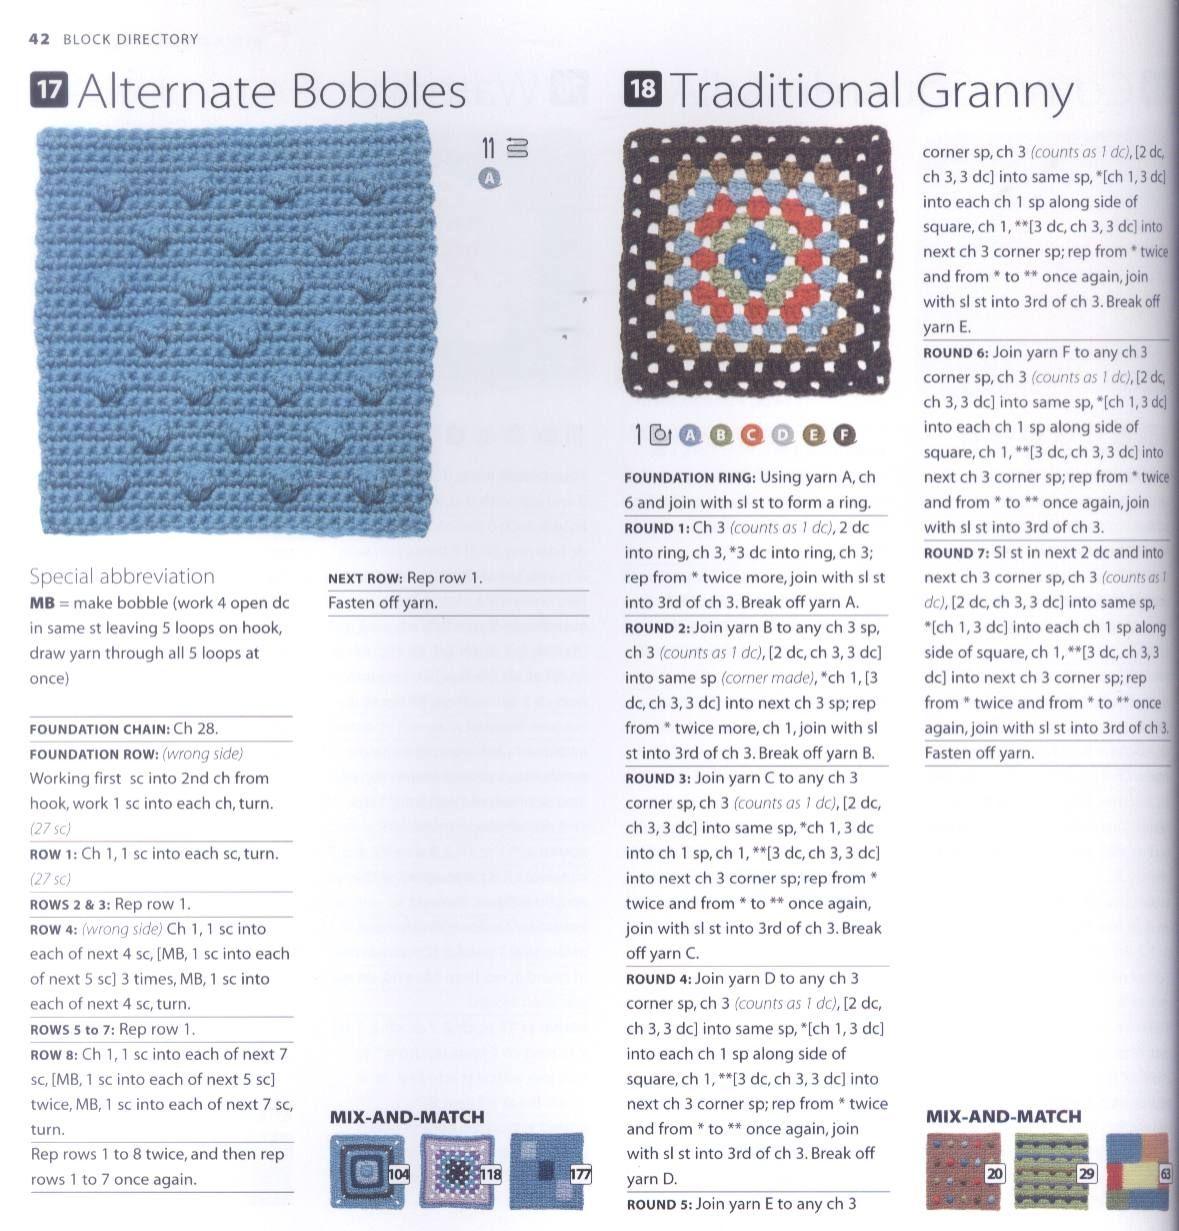 200 Crocheted Blocks for blankets, throws & Afghans 042